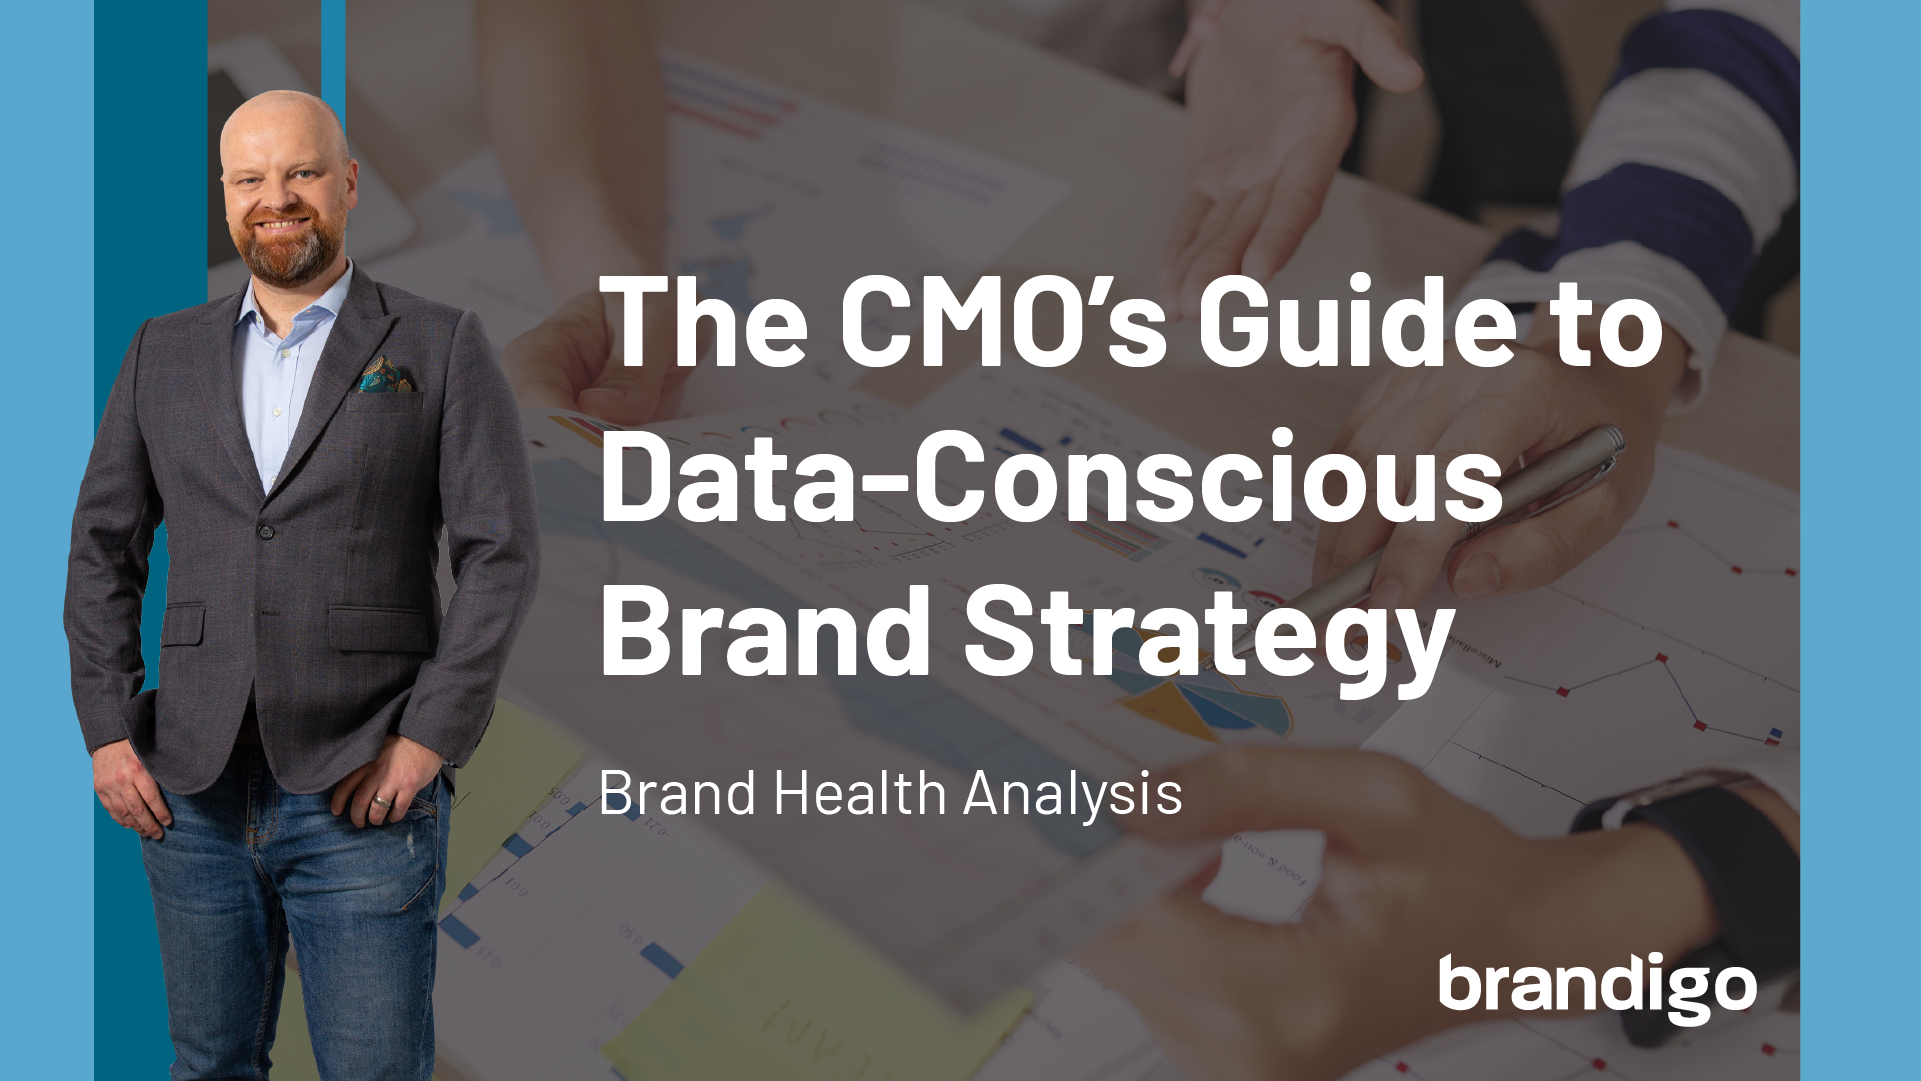 Brand Health Analysis